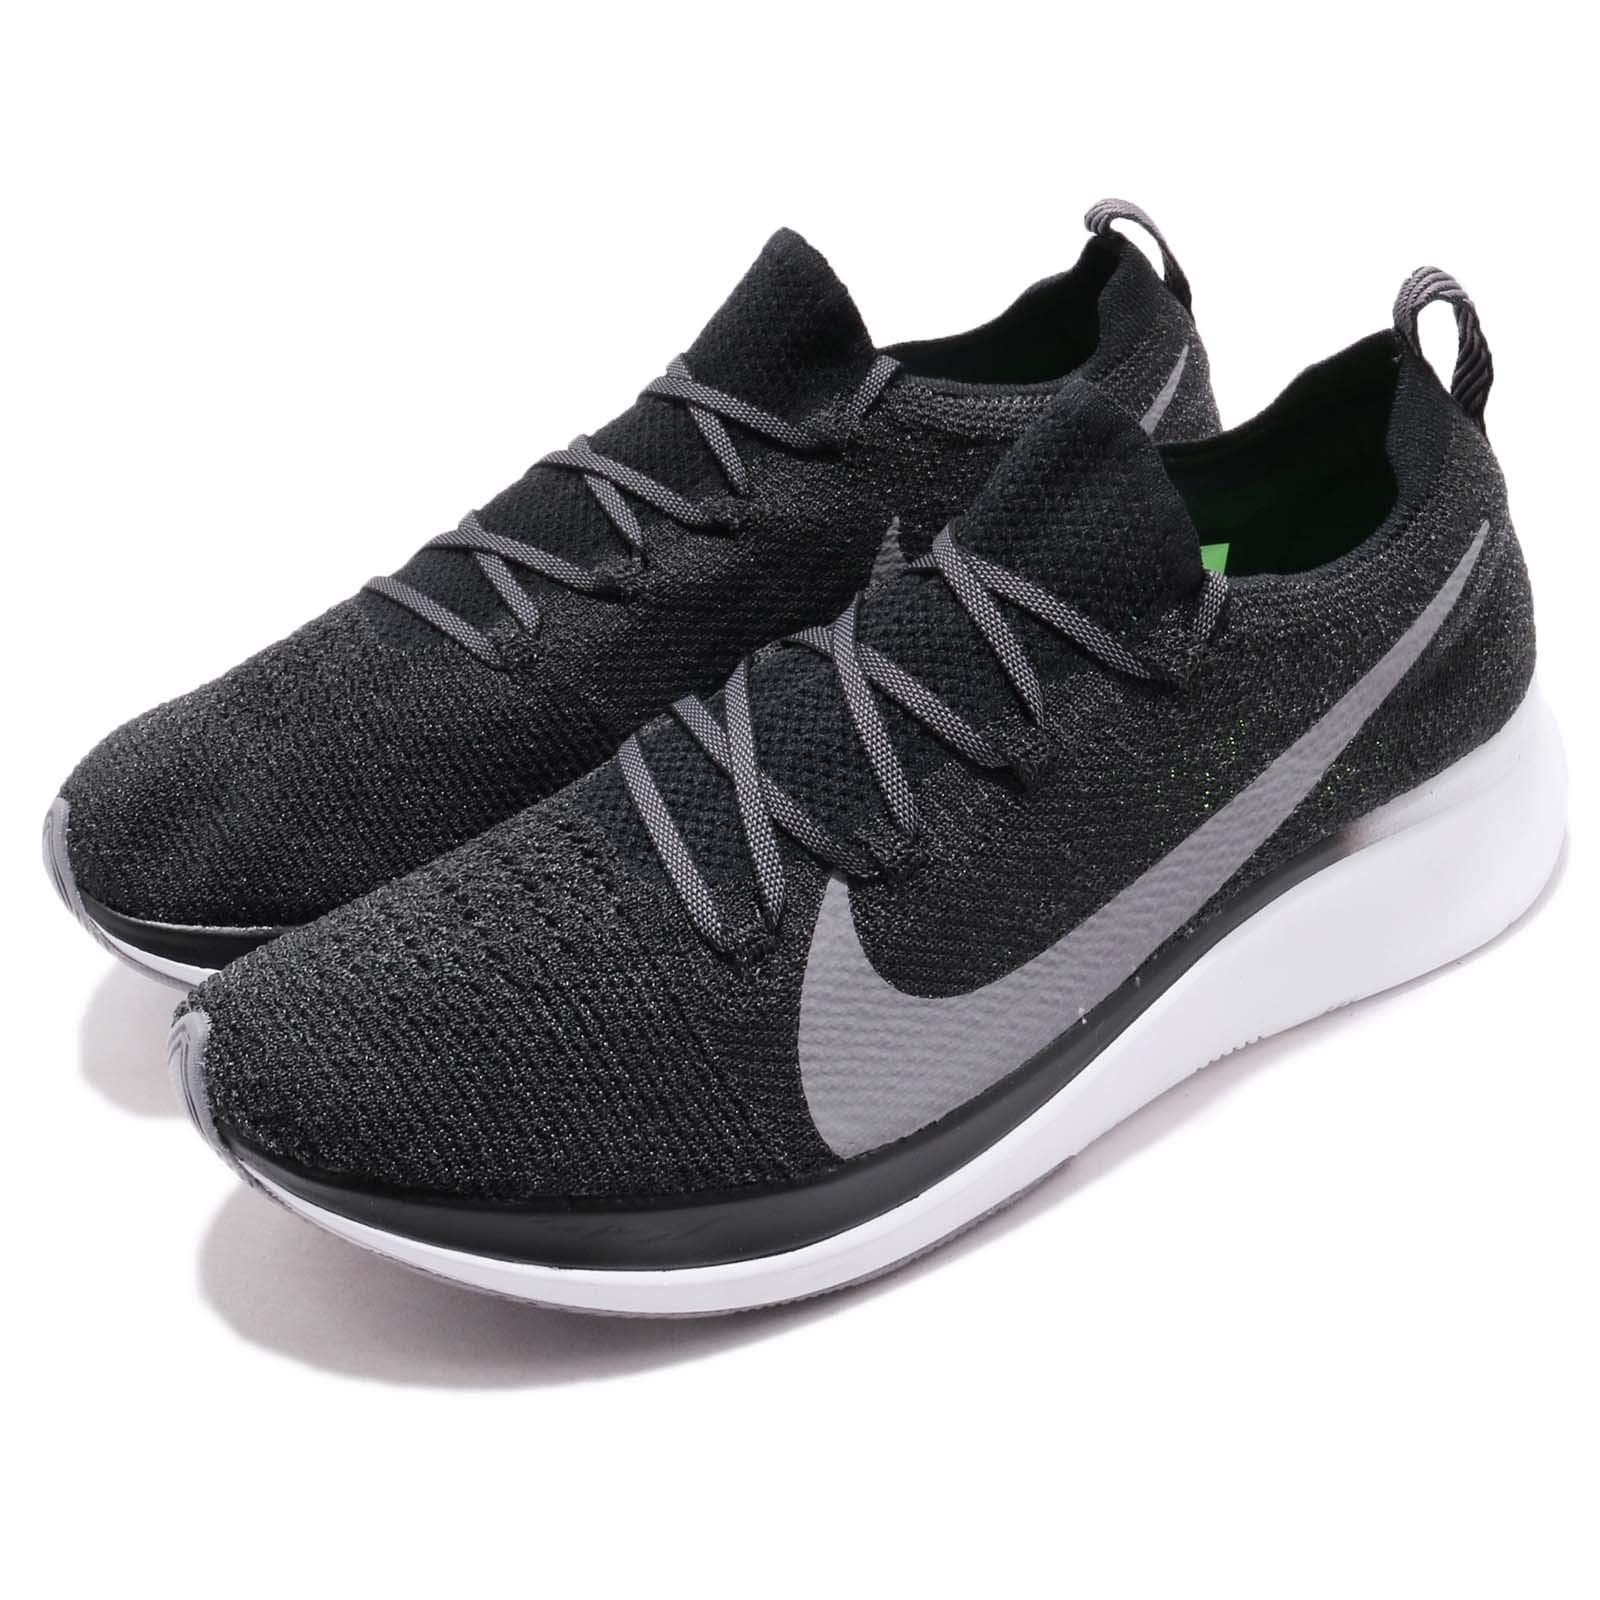 Nike Zoom Fly Flyknit Men's Running Shoe Black/Gunsmoke-White Size 7.5 by Nike (Image #8)